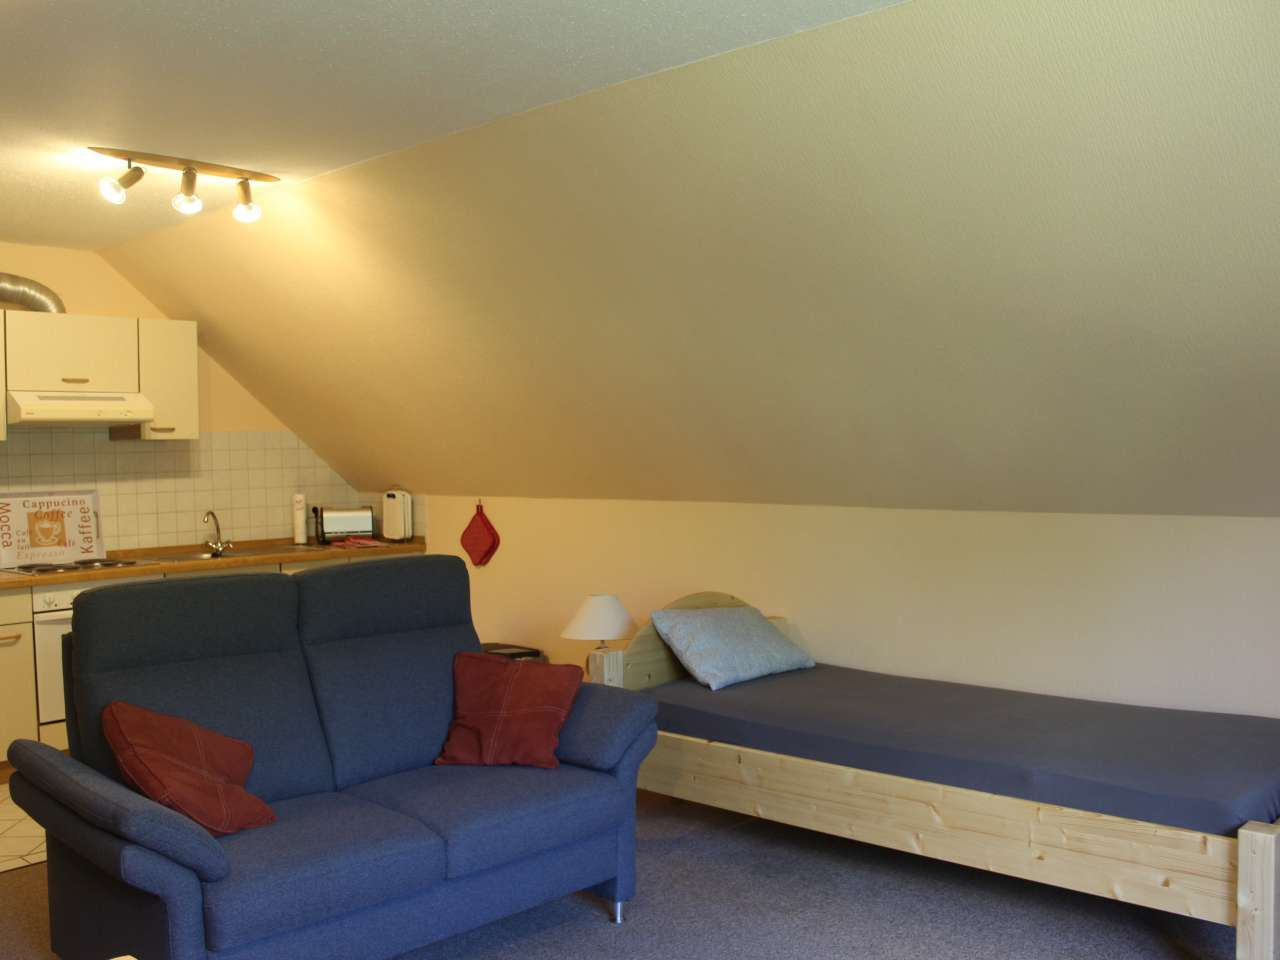 ferienwohnung in heringsdorf ostholstein f r 3 personen heringsdorf l becker. Black Bedroom Furniture Sets. Home Design Ideas